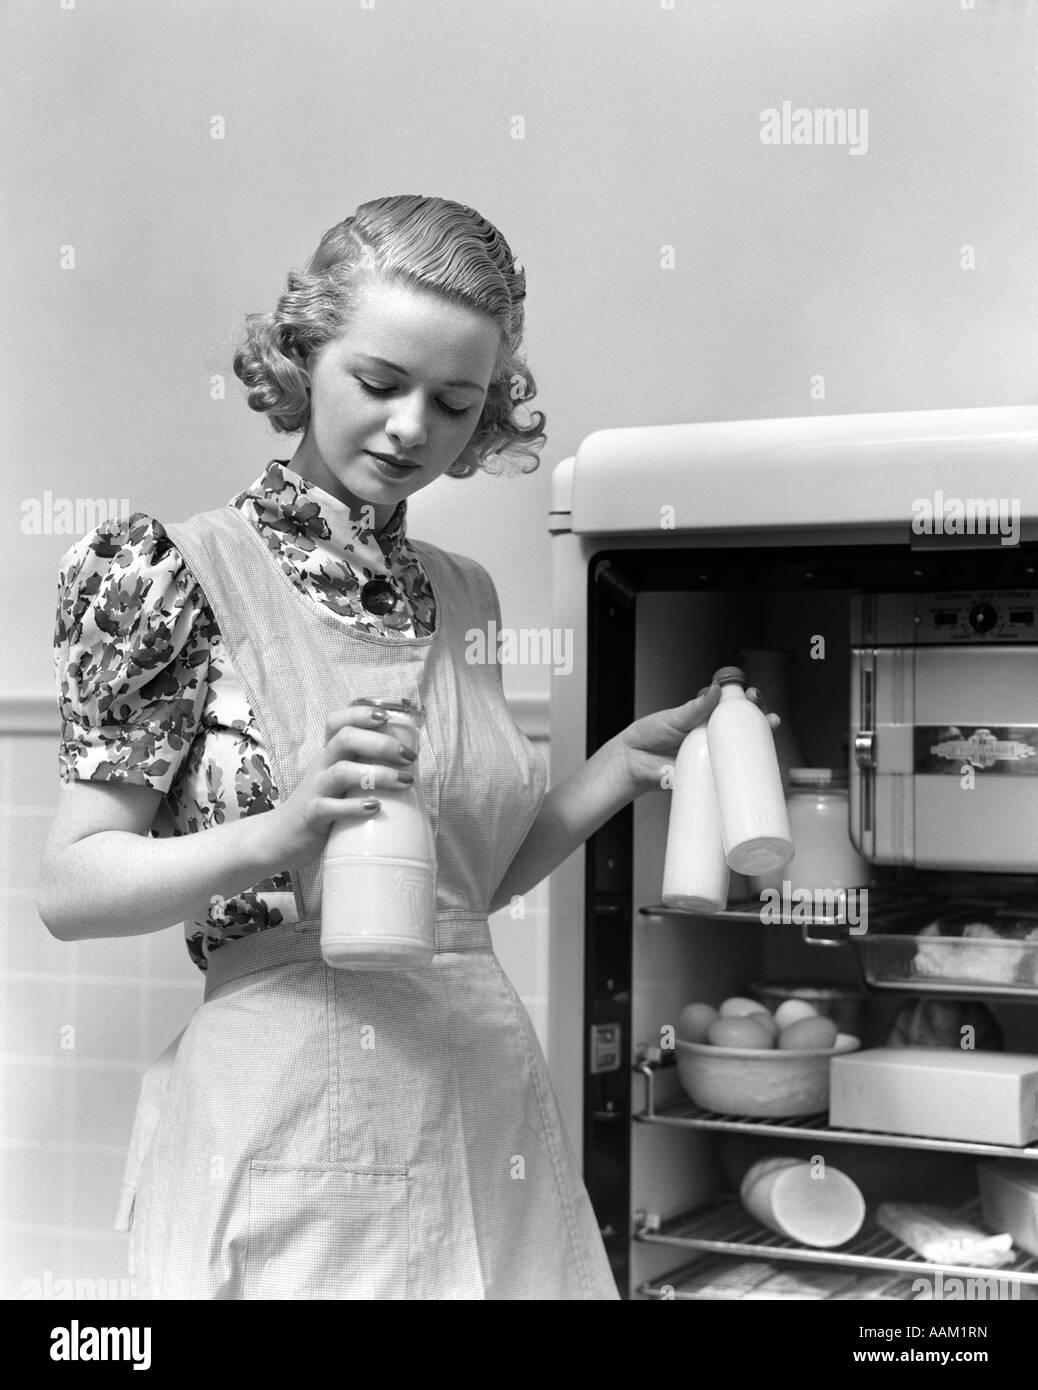 White apron sainsburys - 1930s Woman Wearing A White Apron Taking Milk Out Of The Refrigerator Stock Image